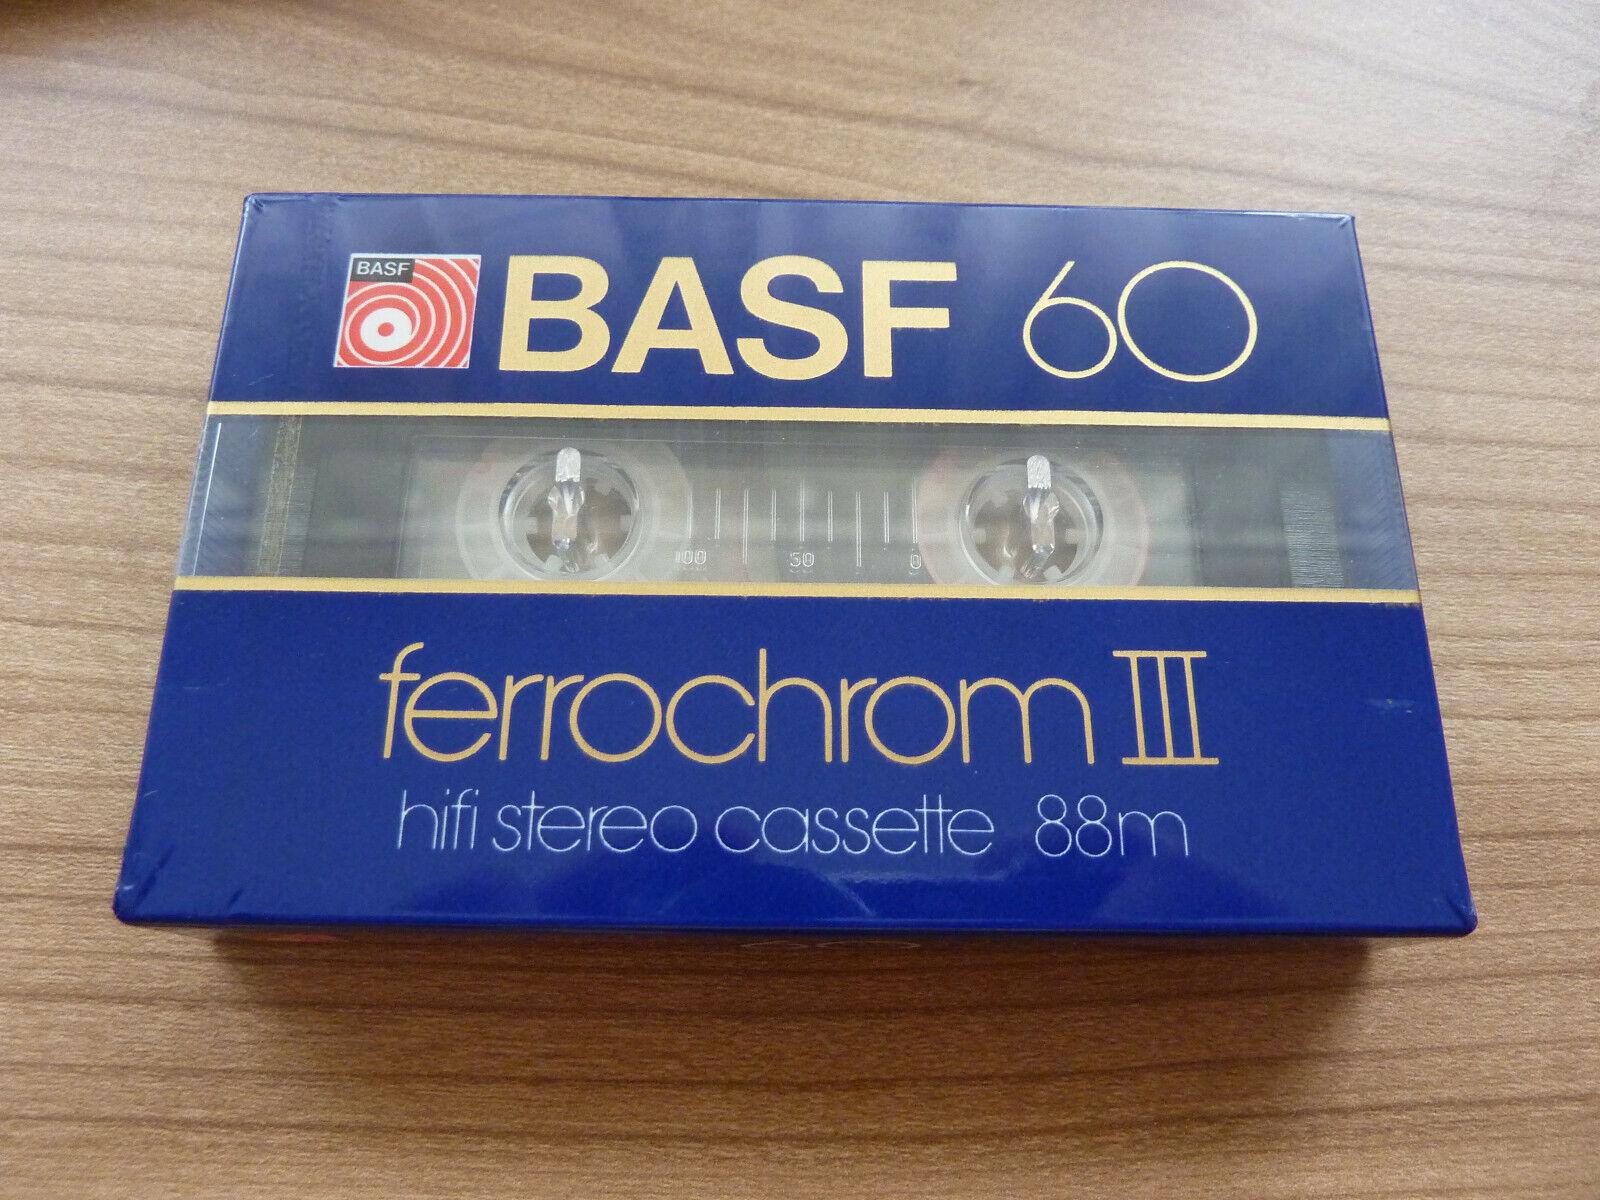 BASF ferrochrom III 60 audiokassette cassette audio tape sealed